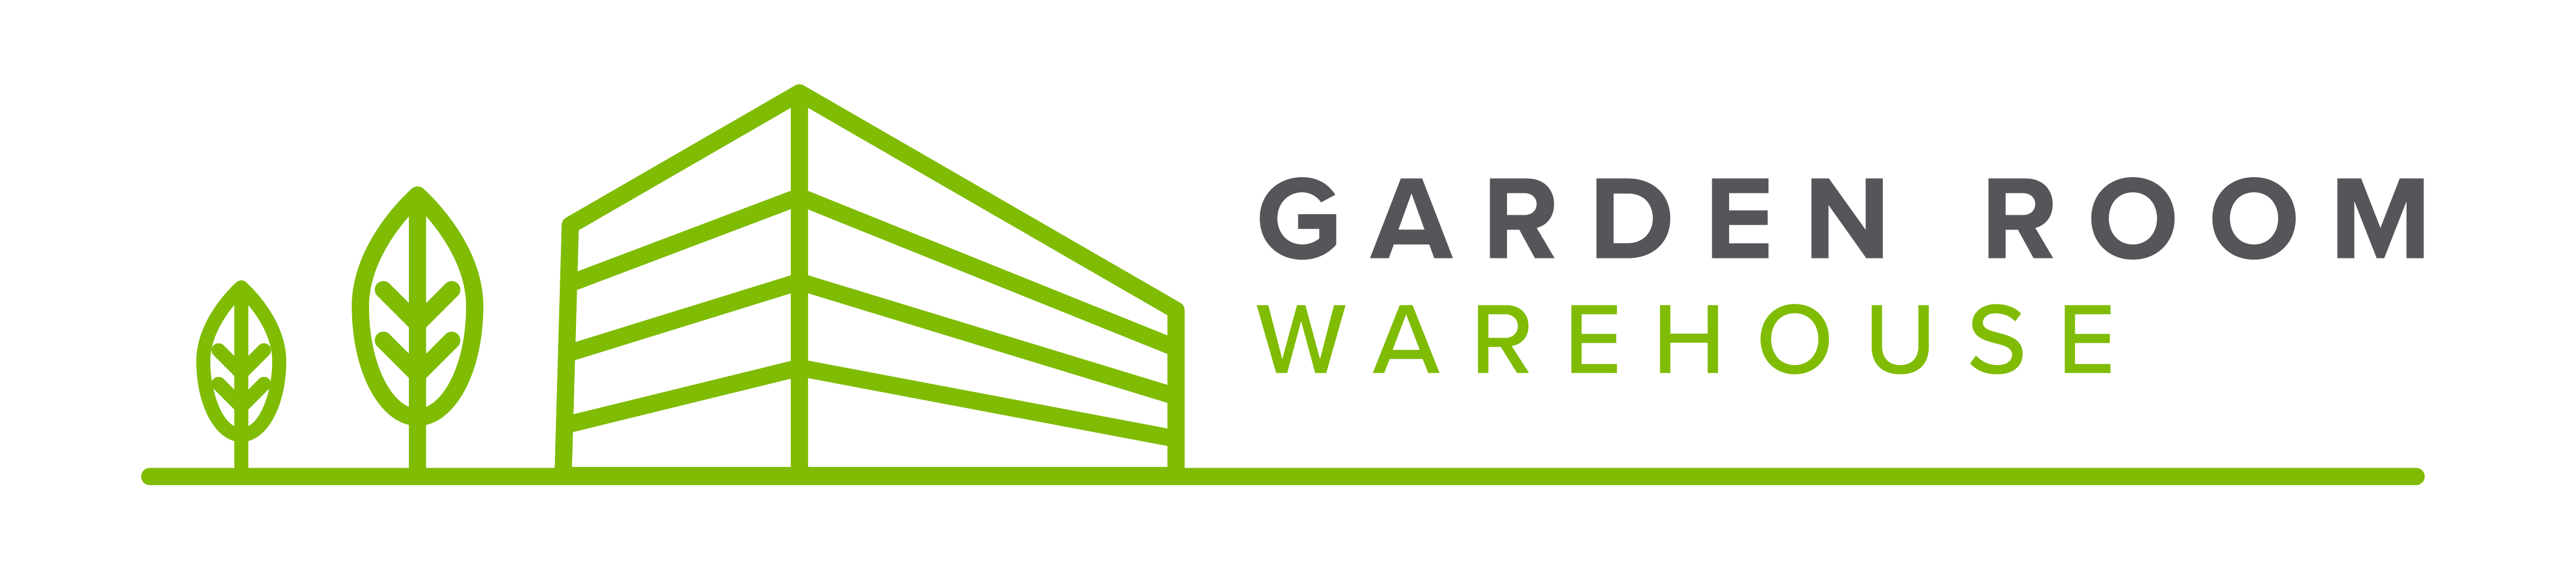 Garden Room Warehouse